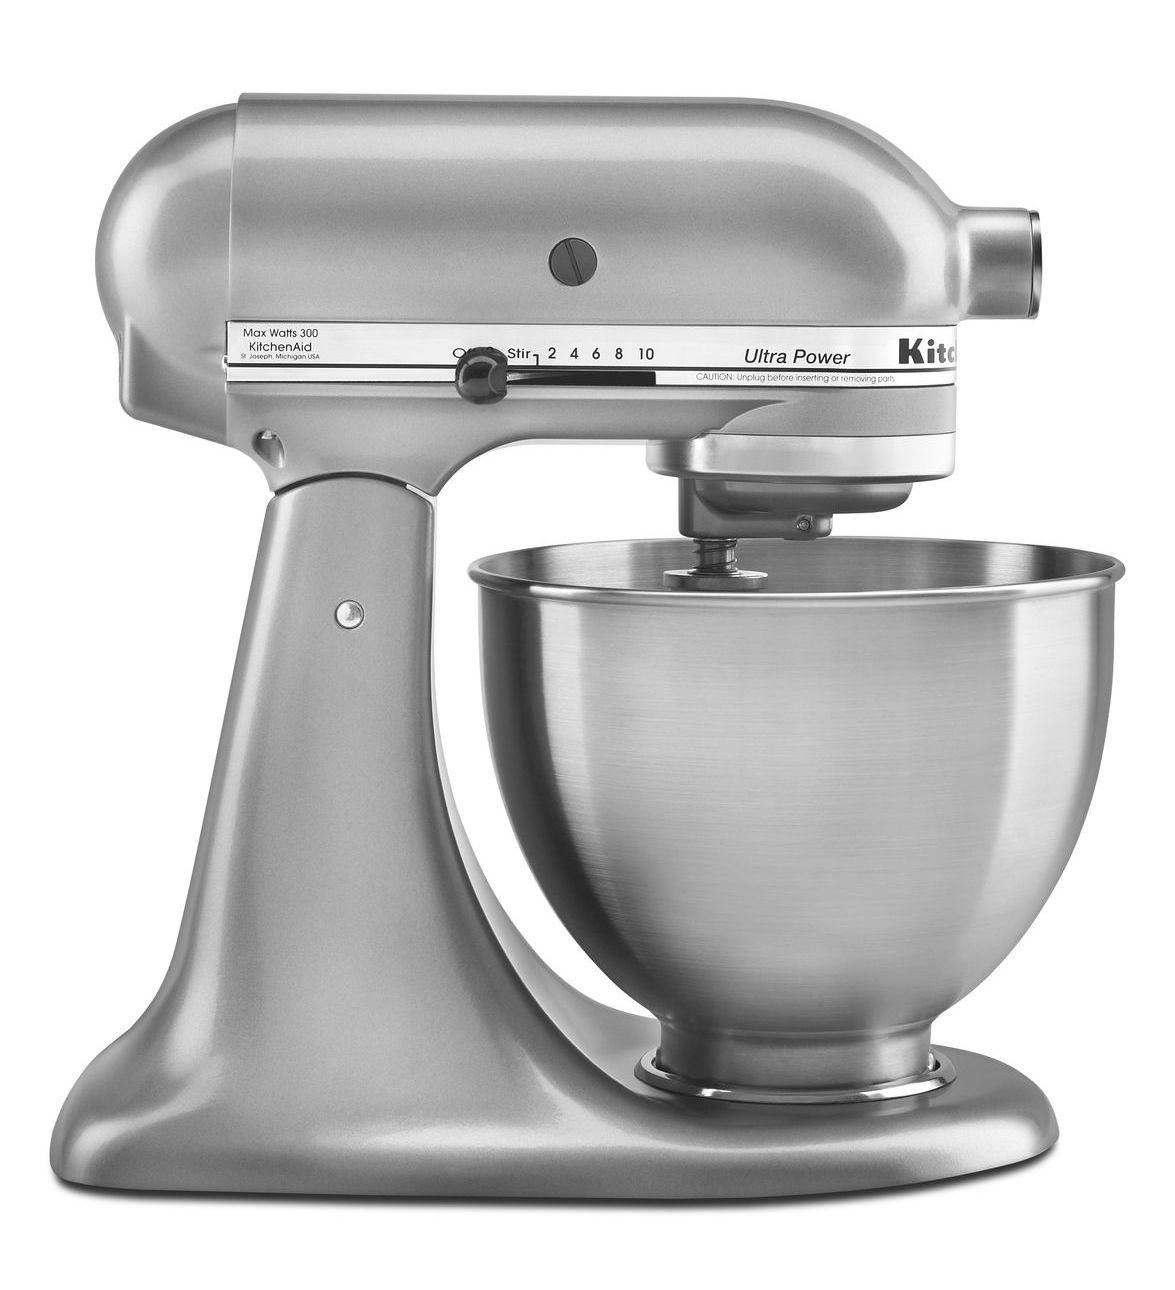 Kitchen aid ultra power mixer Photo - 12